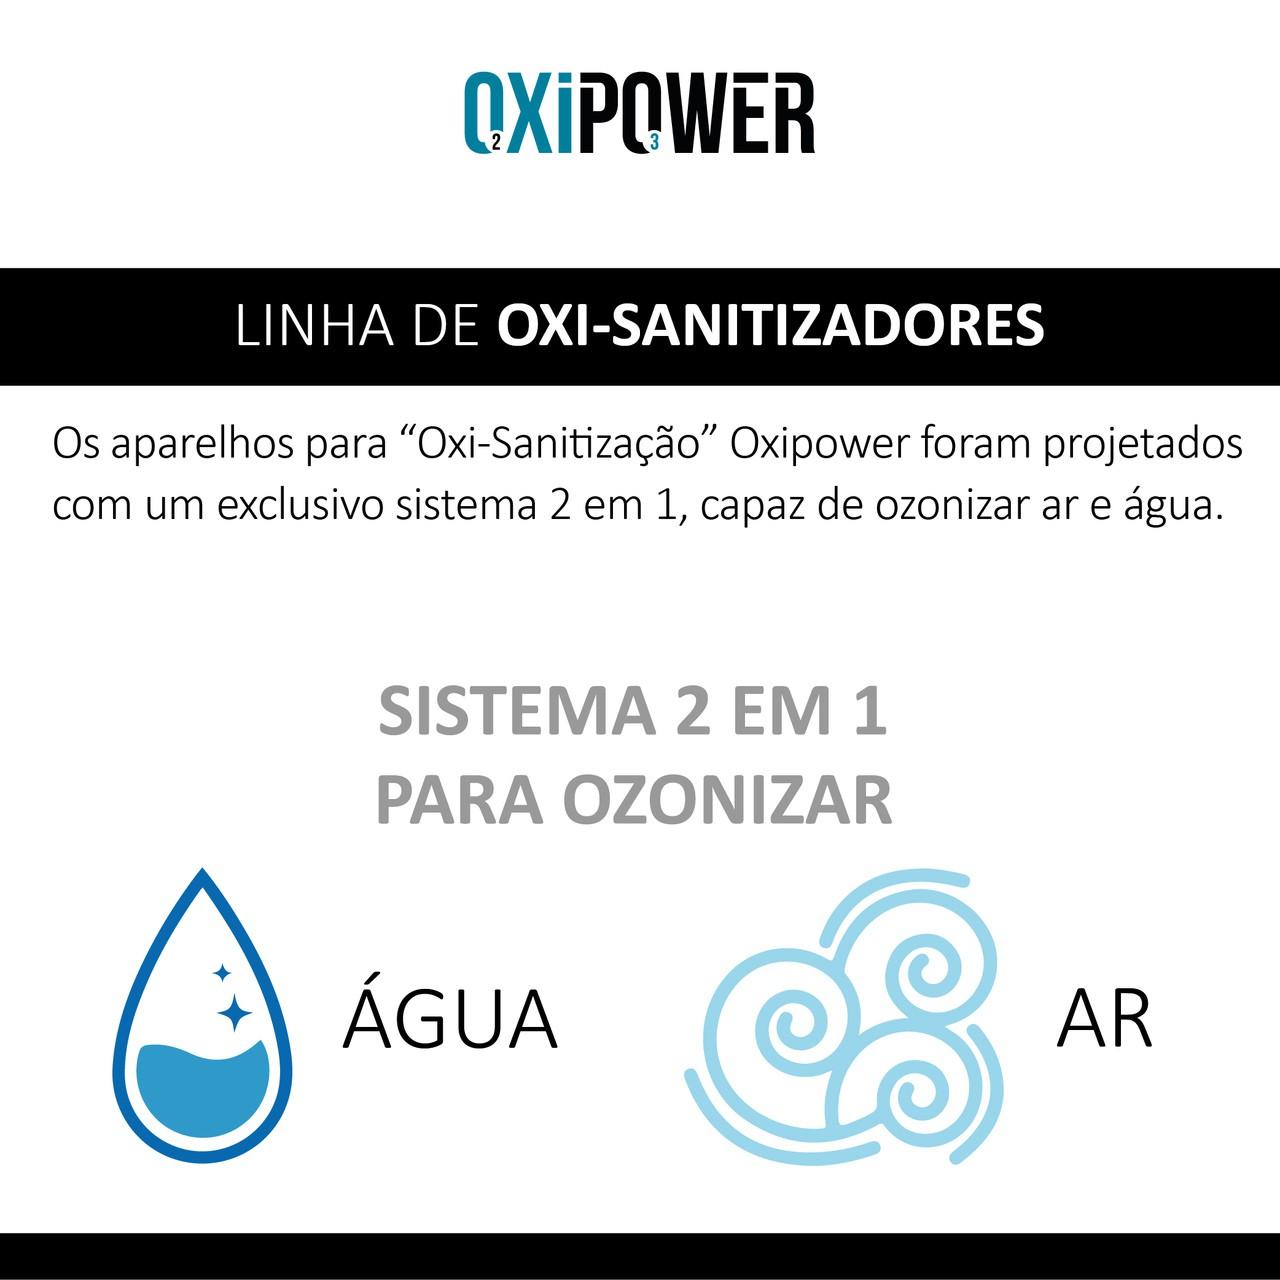 OXPW 13 - OXI-SANITIZADOR 2X1 PARA OZONIZAR AR E ÁGUA - OXI 500.100 + 12 VOLTS